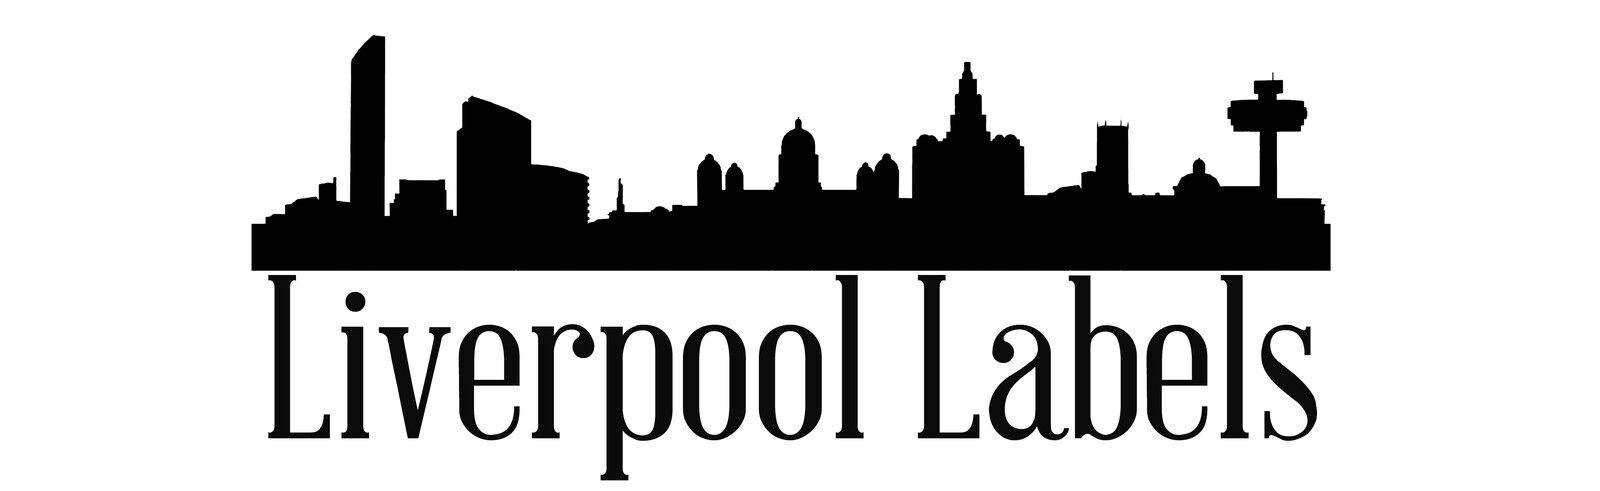 liverpoollabels2014